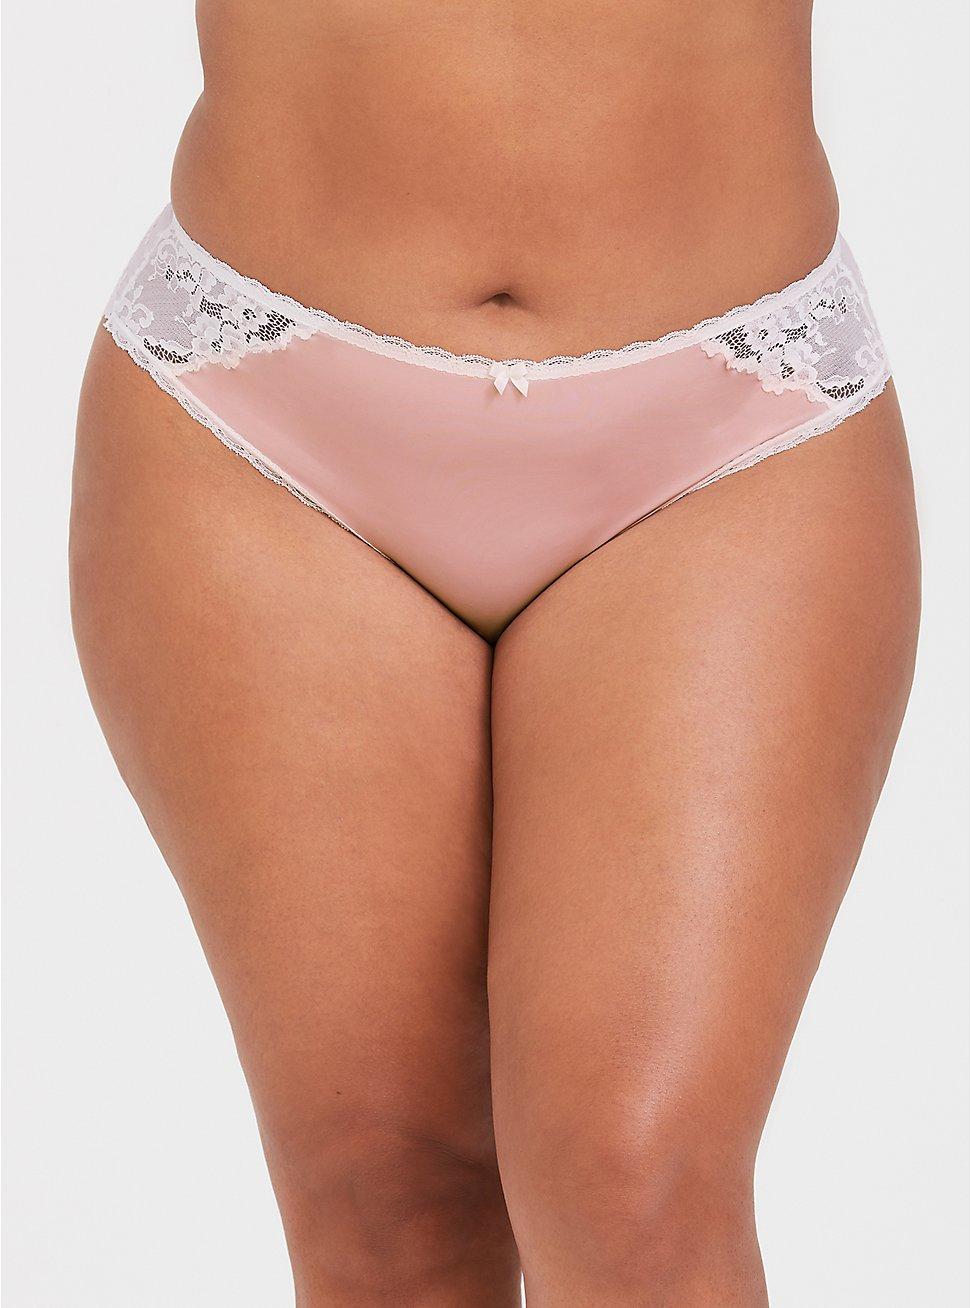 Plus Size Blush Pink Microfiber & Lace Cheekster Panty, LOTUS, hi-res